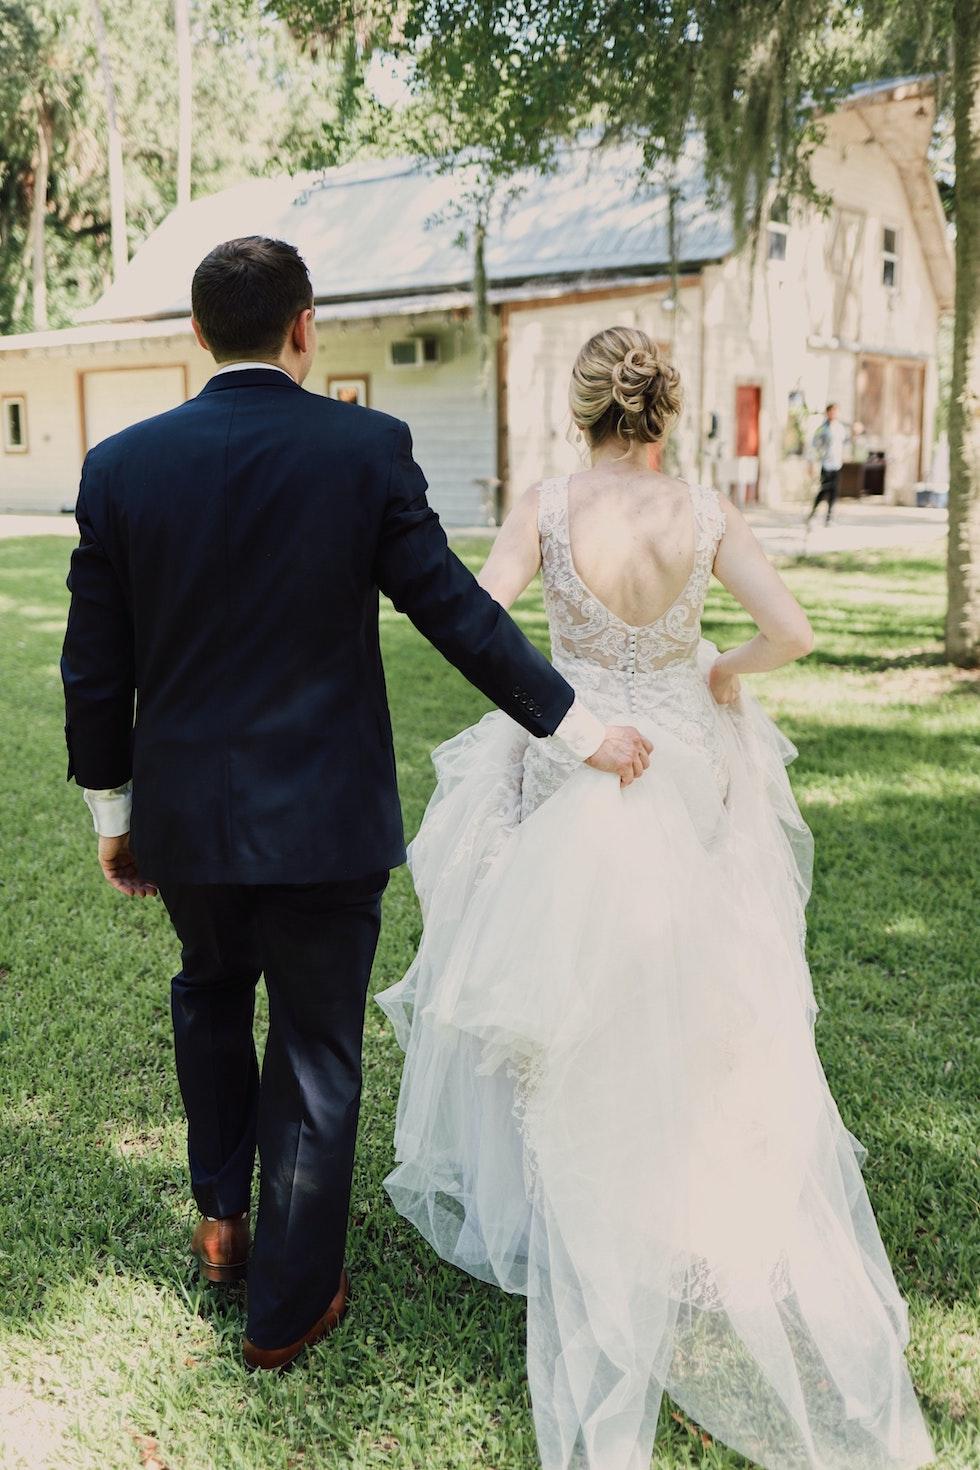 wedding celebrant ceremony with bride and groom